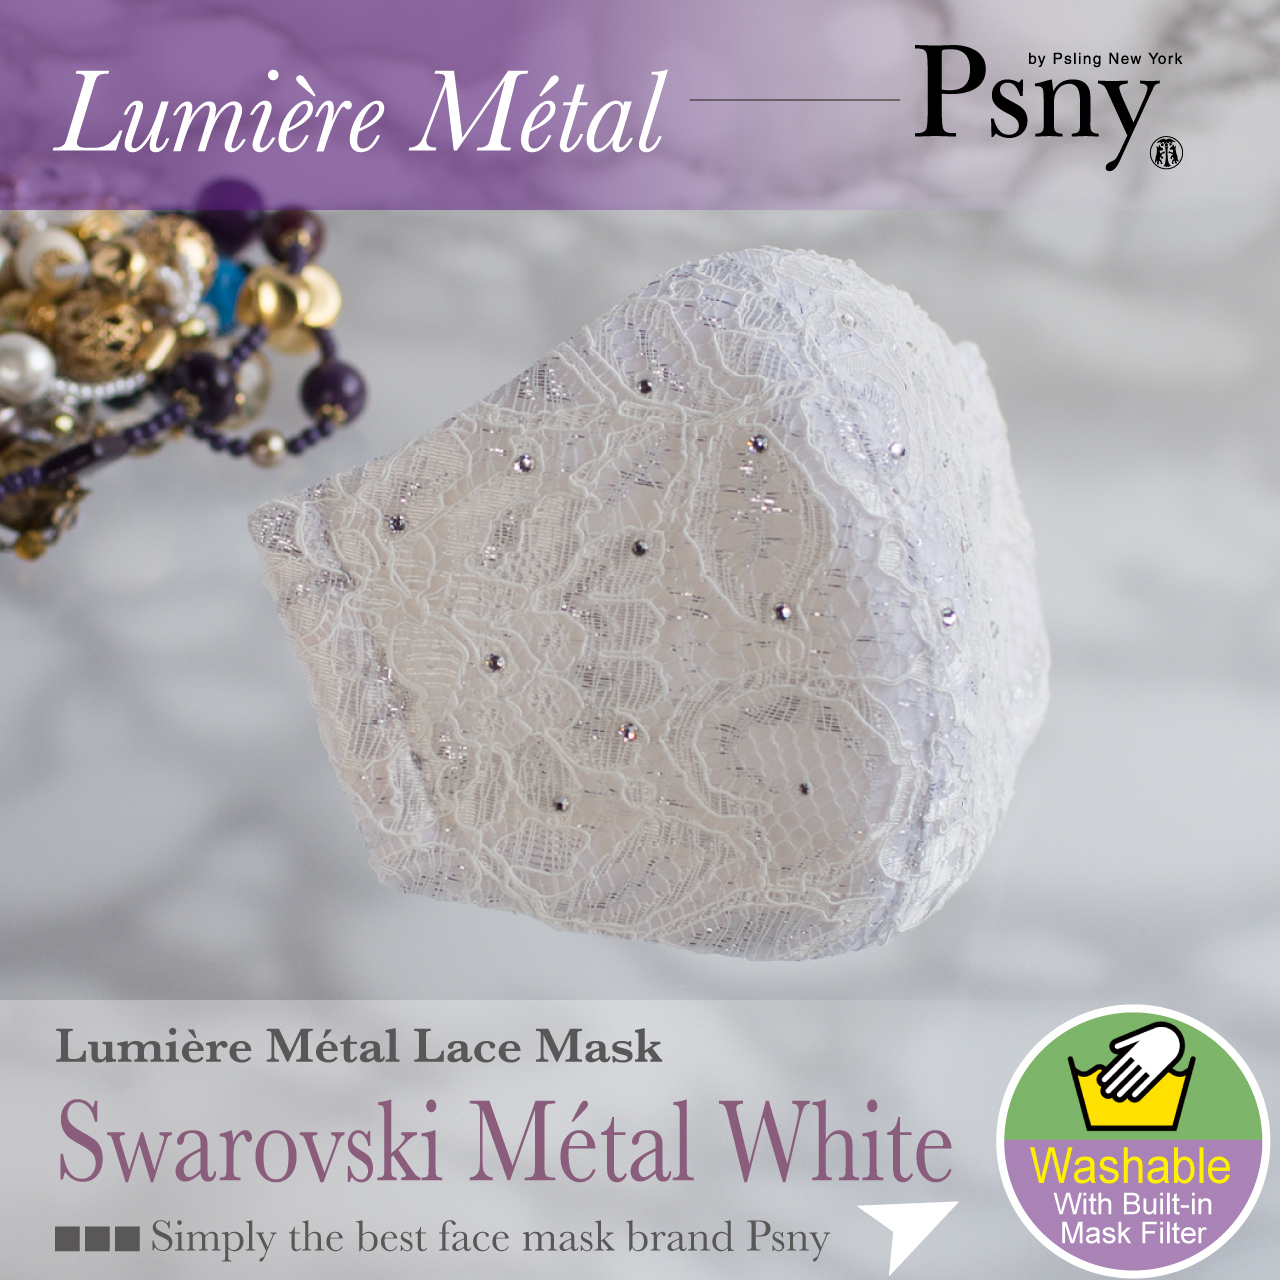 PSNY スワロフスキー メタル レース・ホワイト  花粉  不織布フィルター 立体 大人用 上品  マスク 送料無料 LM3s